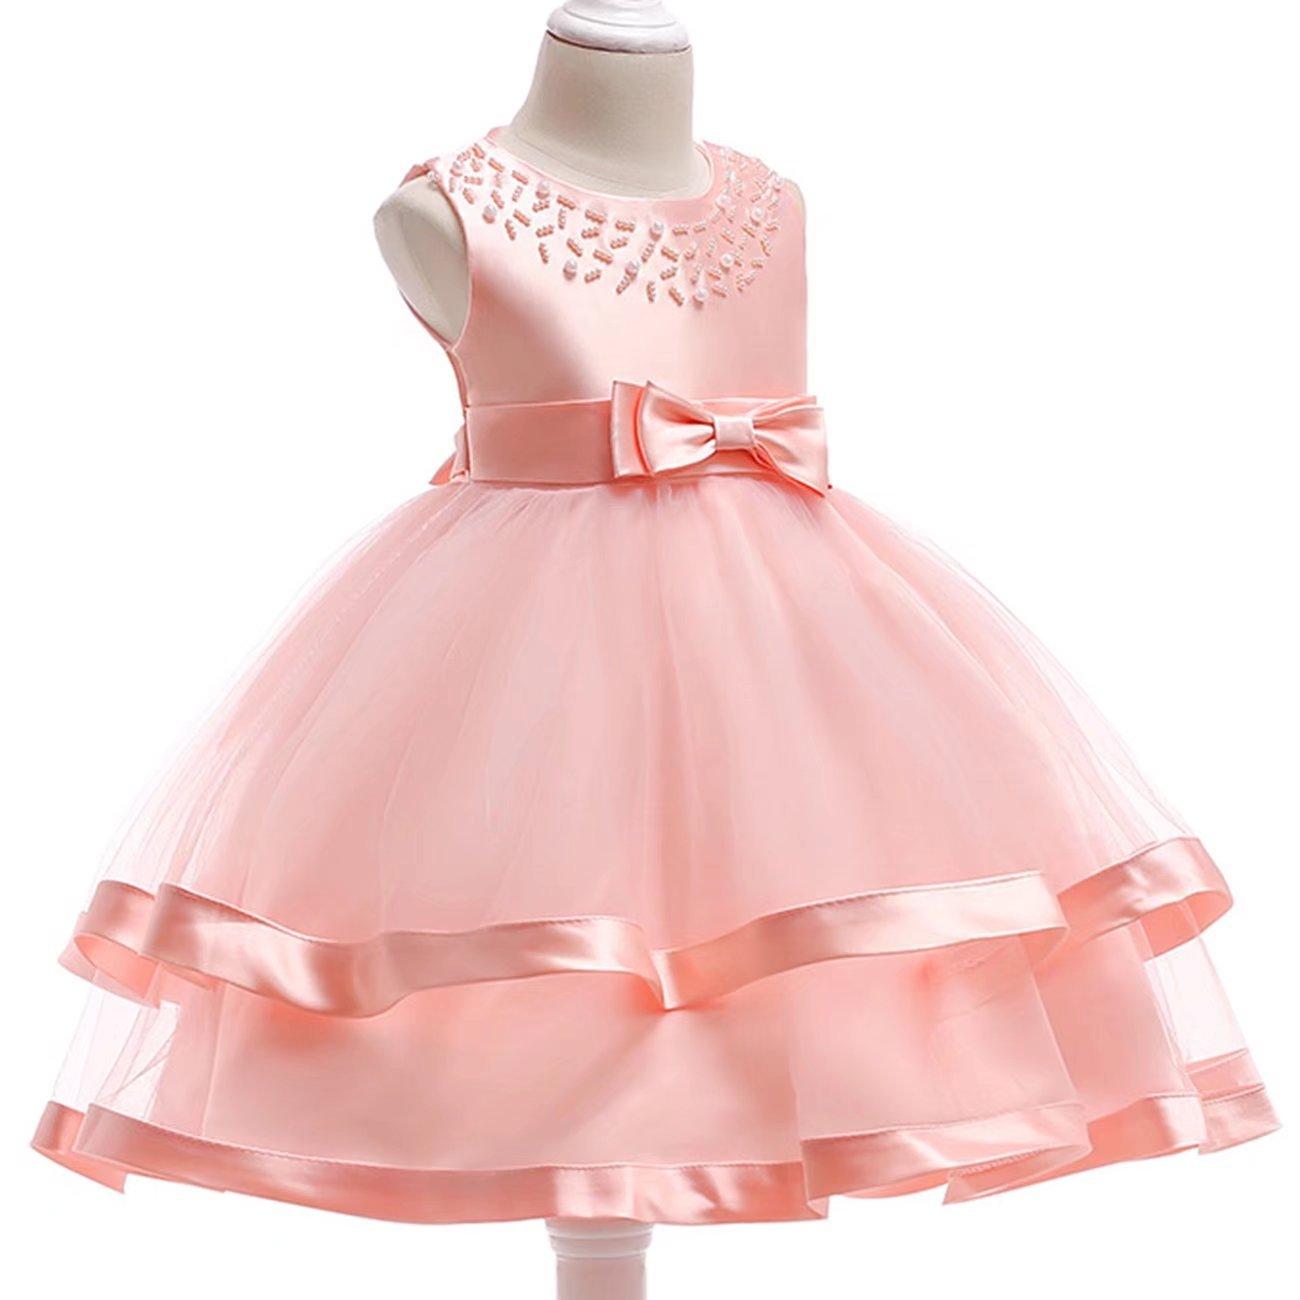 YOUTODRESS - dama Vestido diseño de princesa flor de satén para dama ...